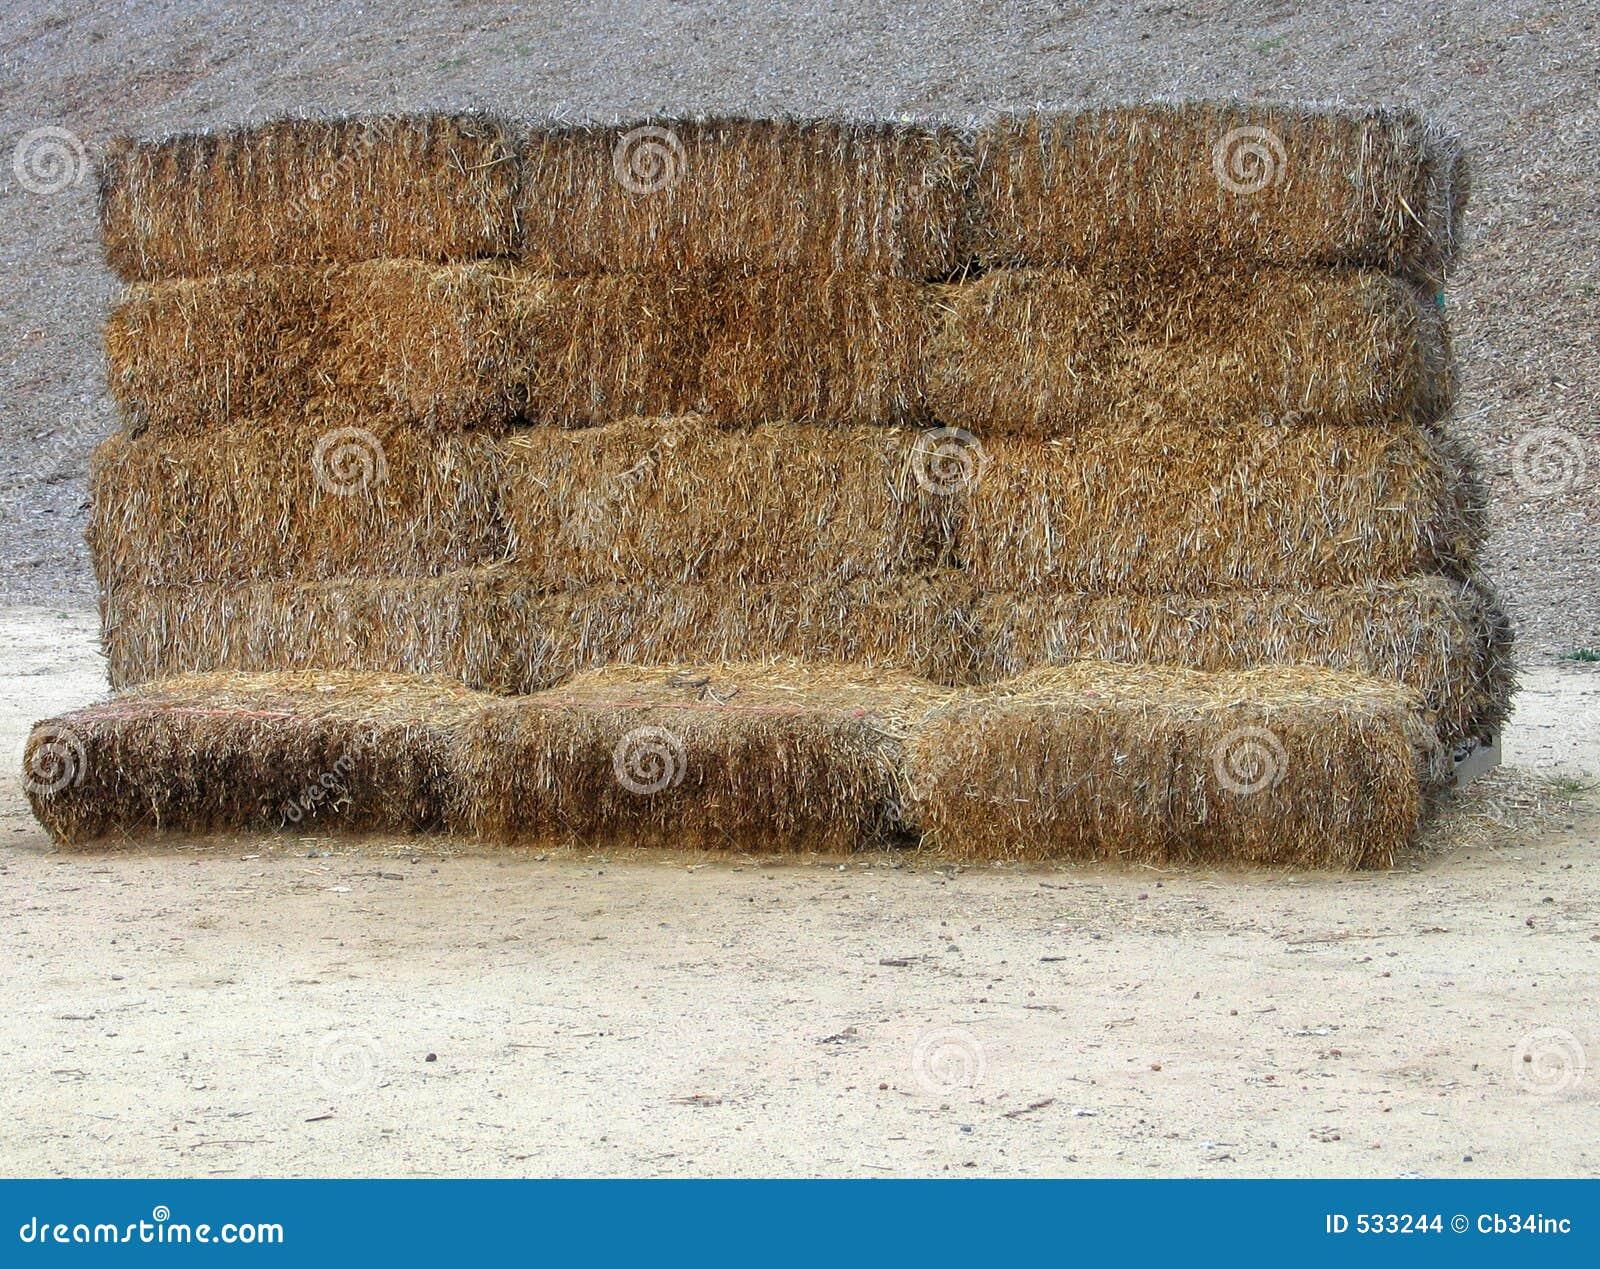 Download 大包十八干草 库存照片. 图片 包括有 橙色, 粗砺, 墙纸, 困难, 秸杆, 干草, 大包, 五颜六色, browne - 533244